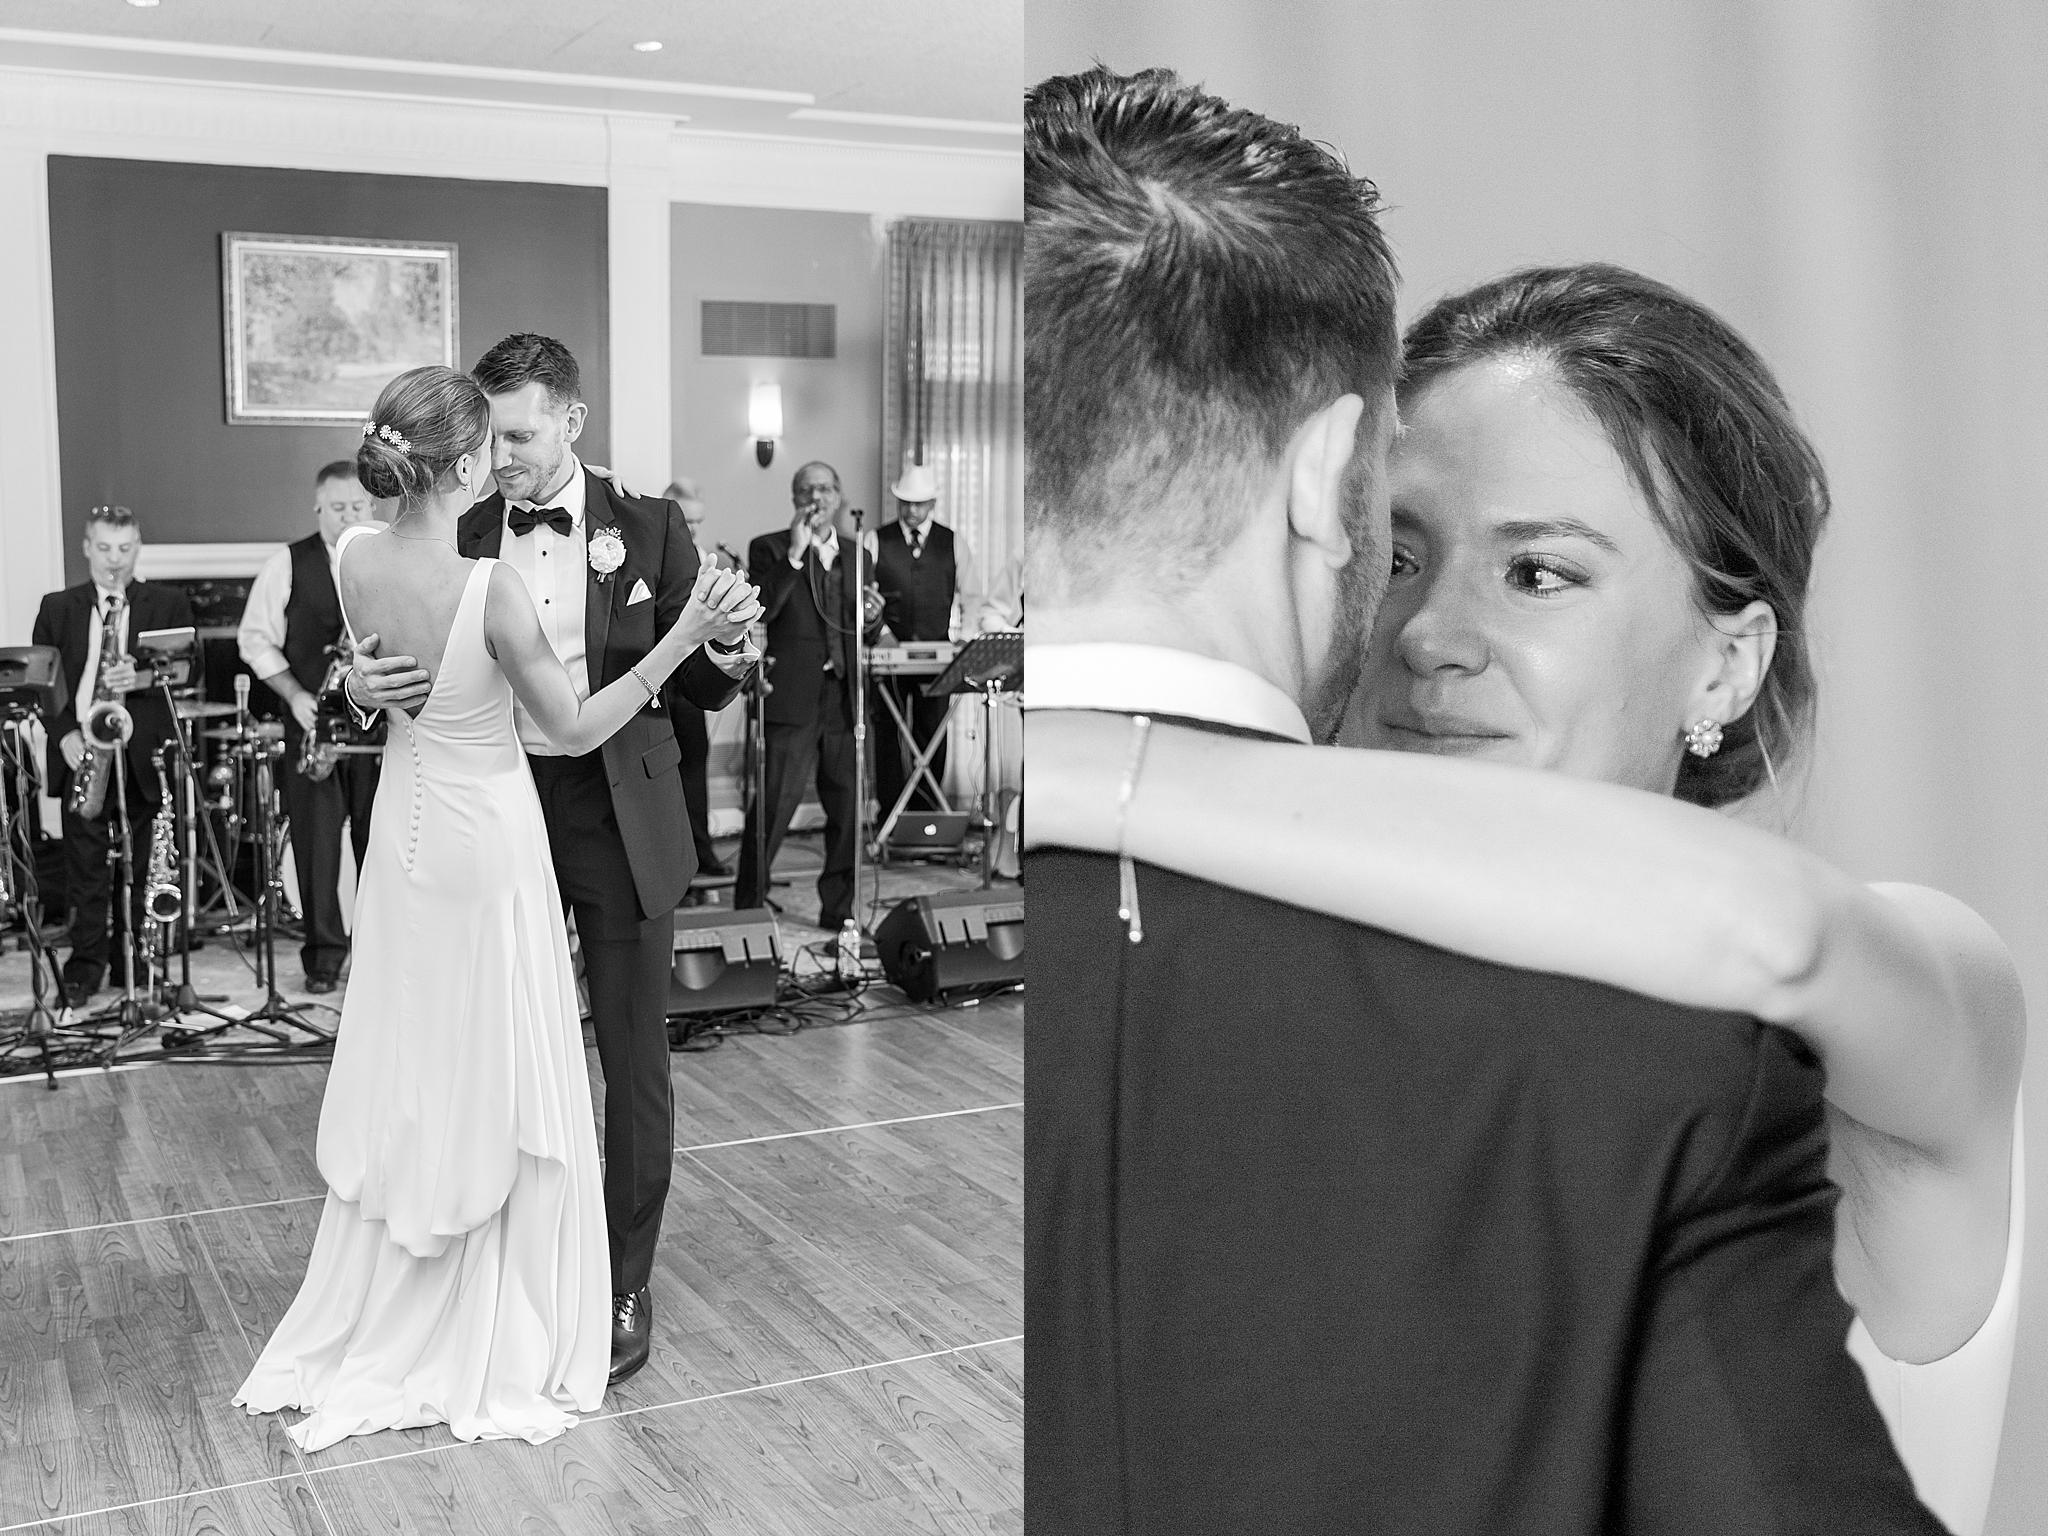 detroit-wedding-photographer-grosse-pointe-academy-chapel-detroit-golf-club-wedding-carly-matt-by-courtney-carolyn-photography_0090.jpg